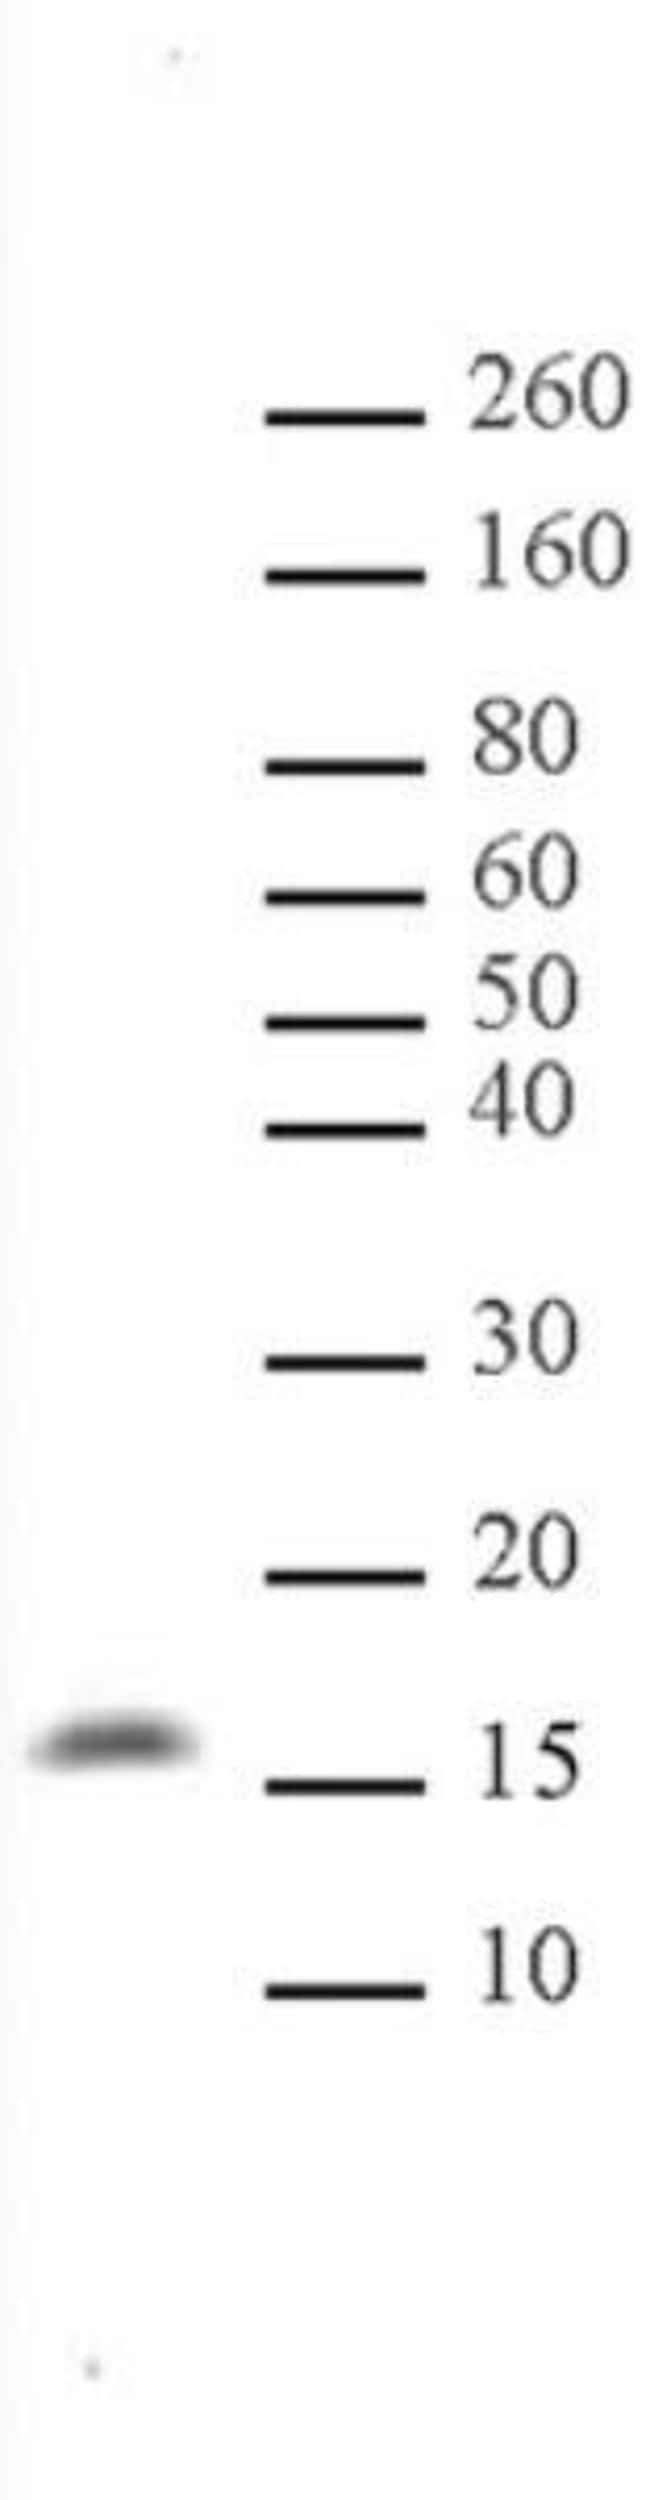 Histone H3K122me1 Rabbit anti-Human, Unconjugated, Polyclonal, Active Motif:Antibodies:Primary